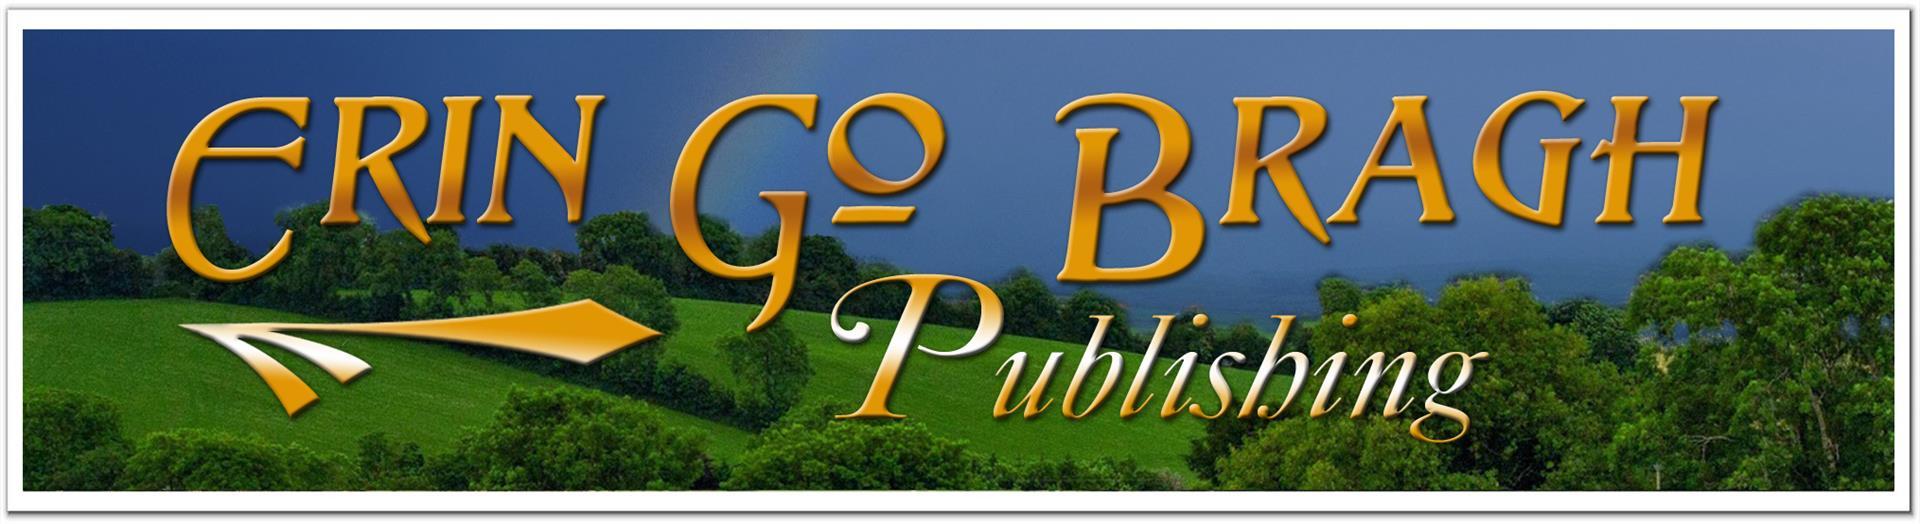 erin-go-braugh-publishing5